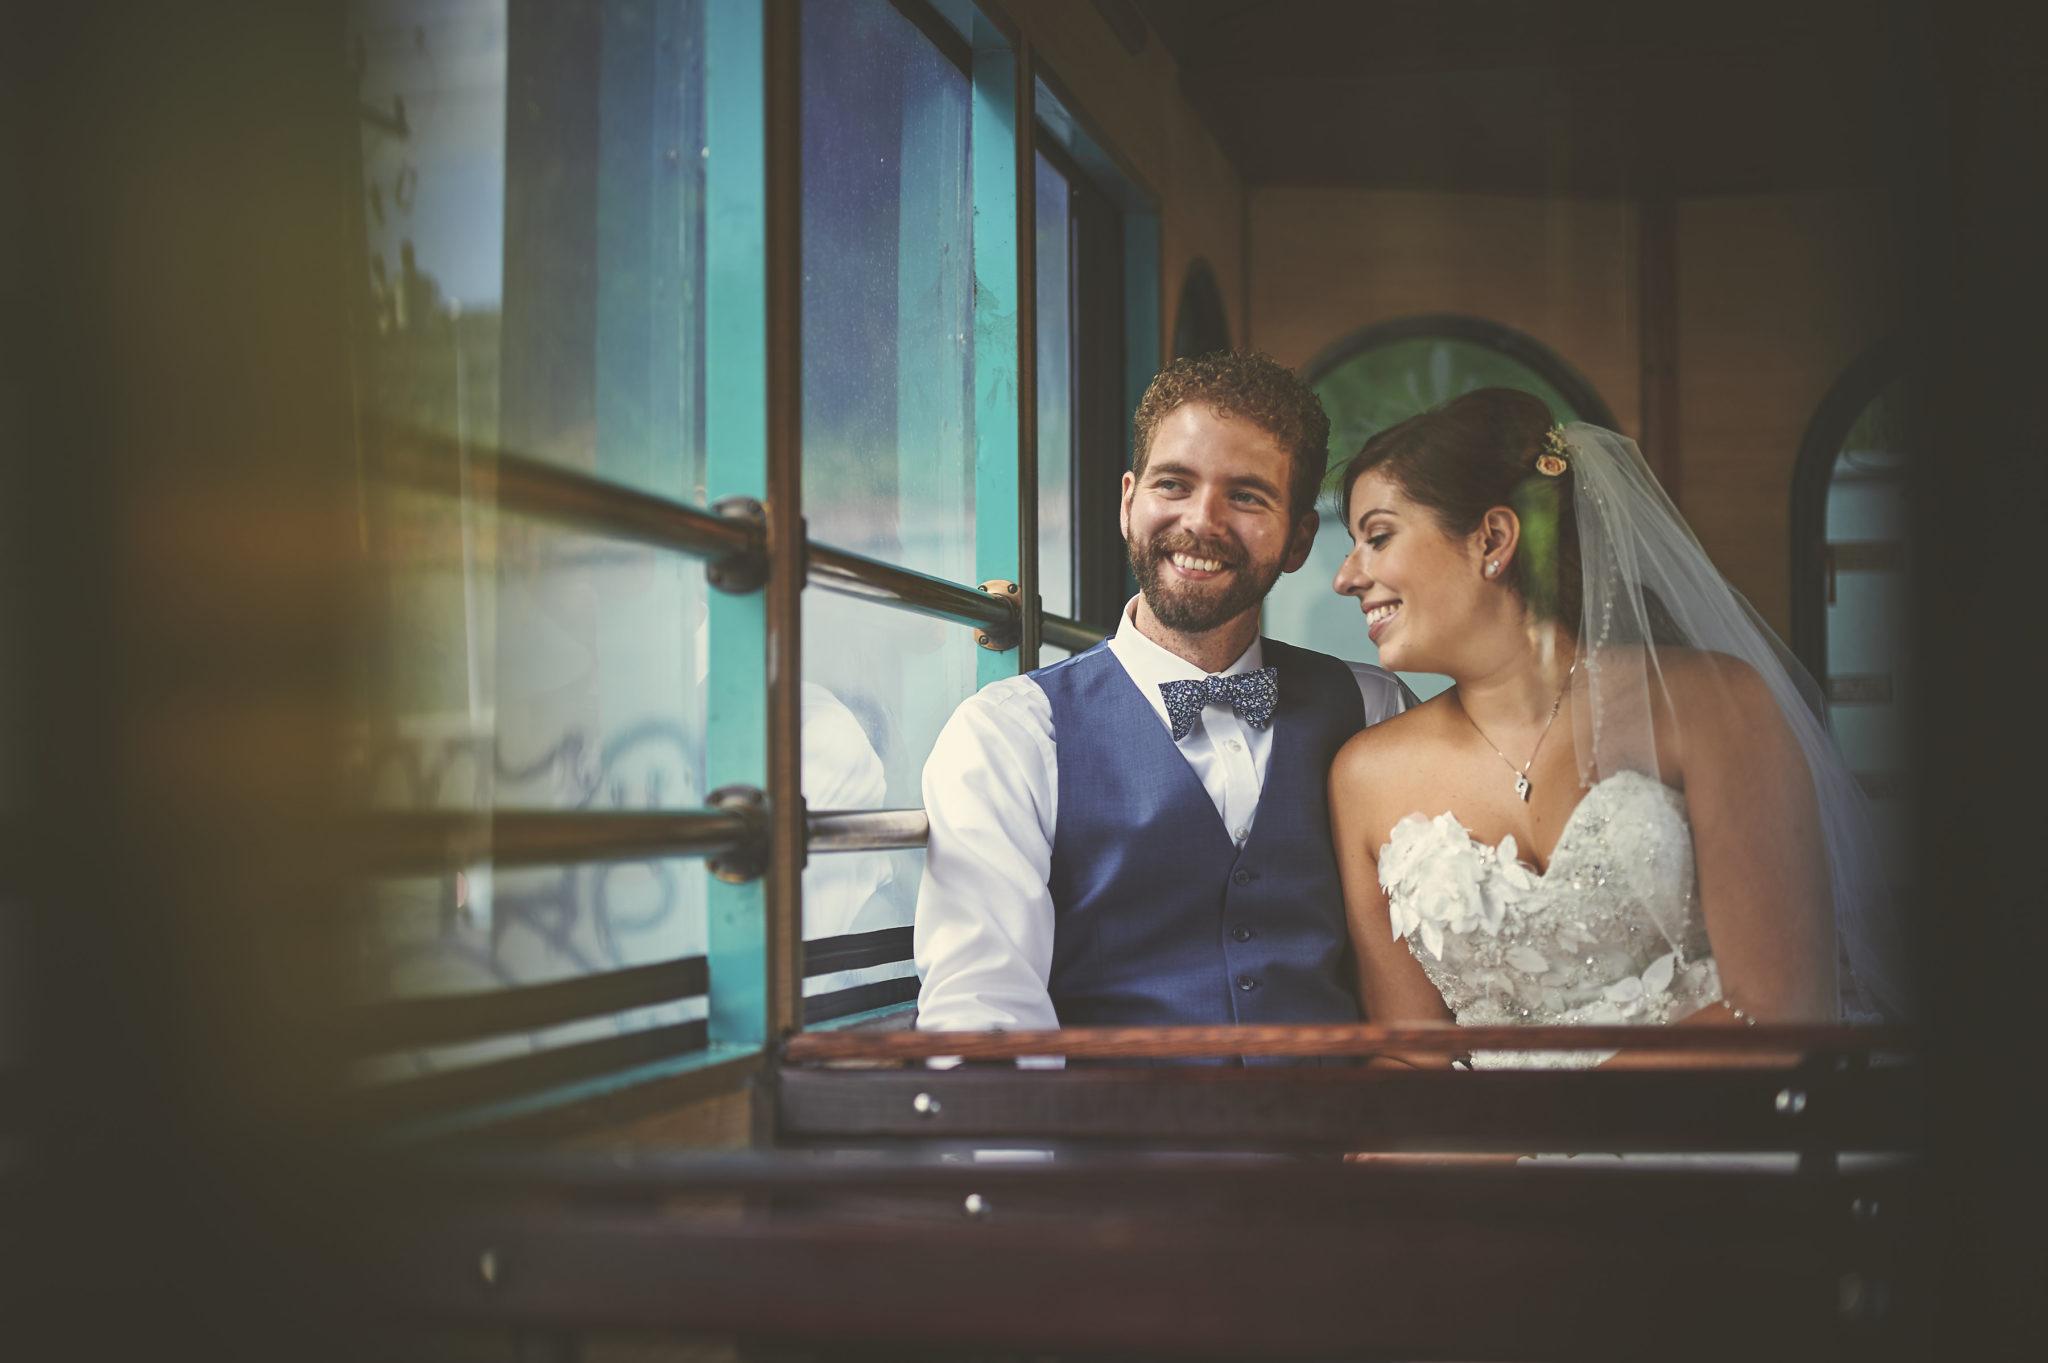 St John's wedding transportation, Classic Carriage Trolley, NL Train, St. John's Trolley, Wedding Transportation Rental, Luxury Vehicles NL